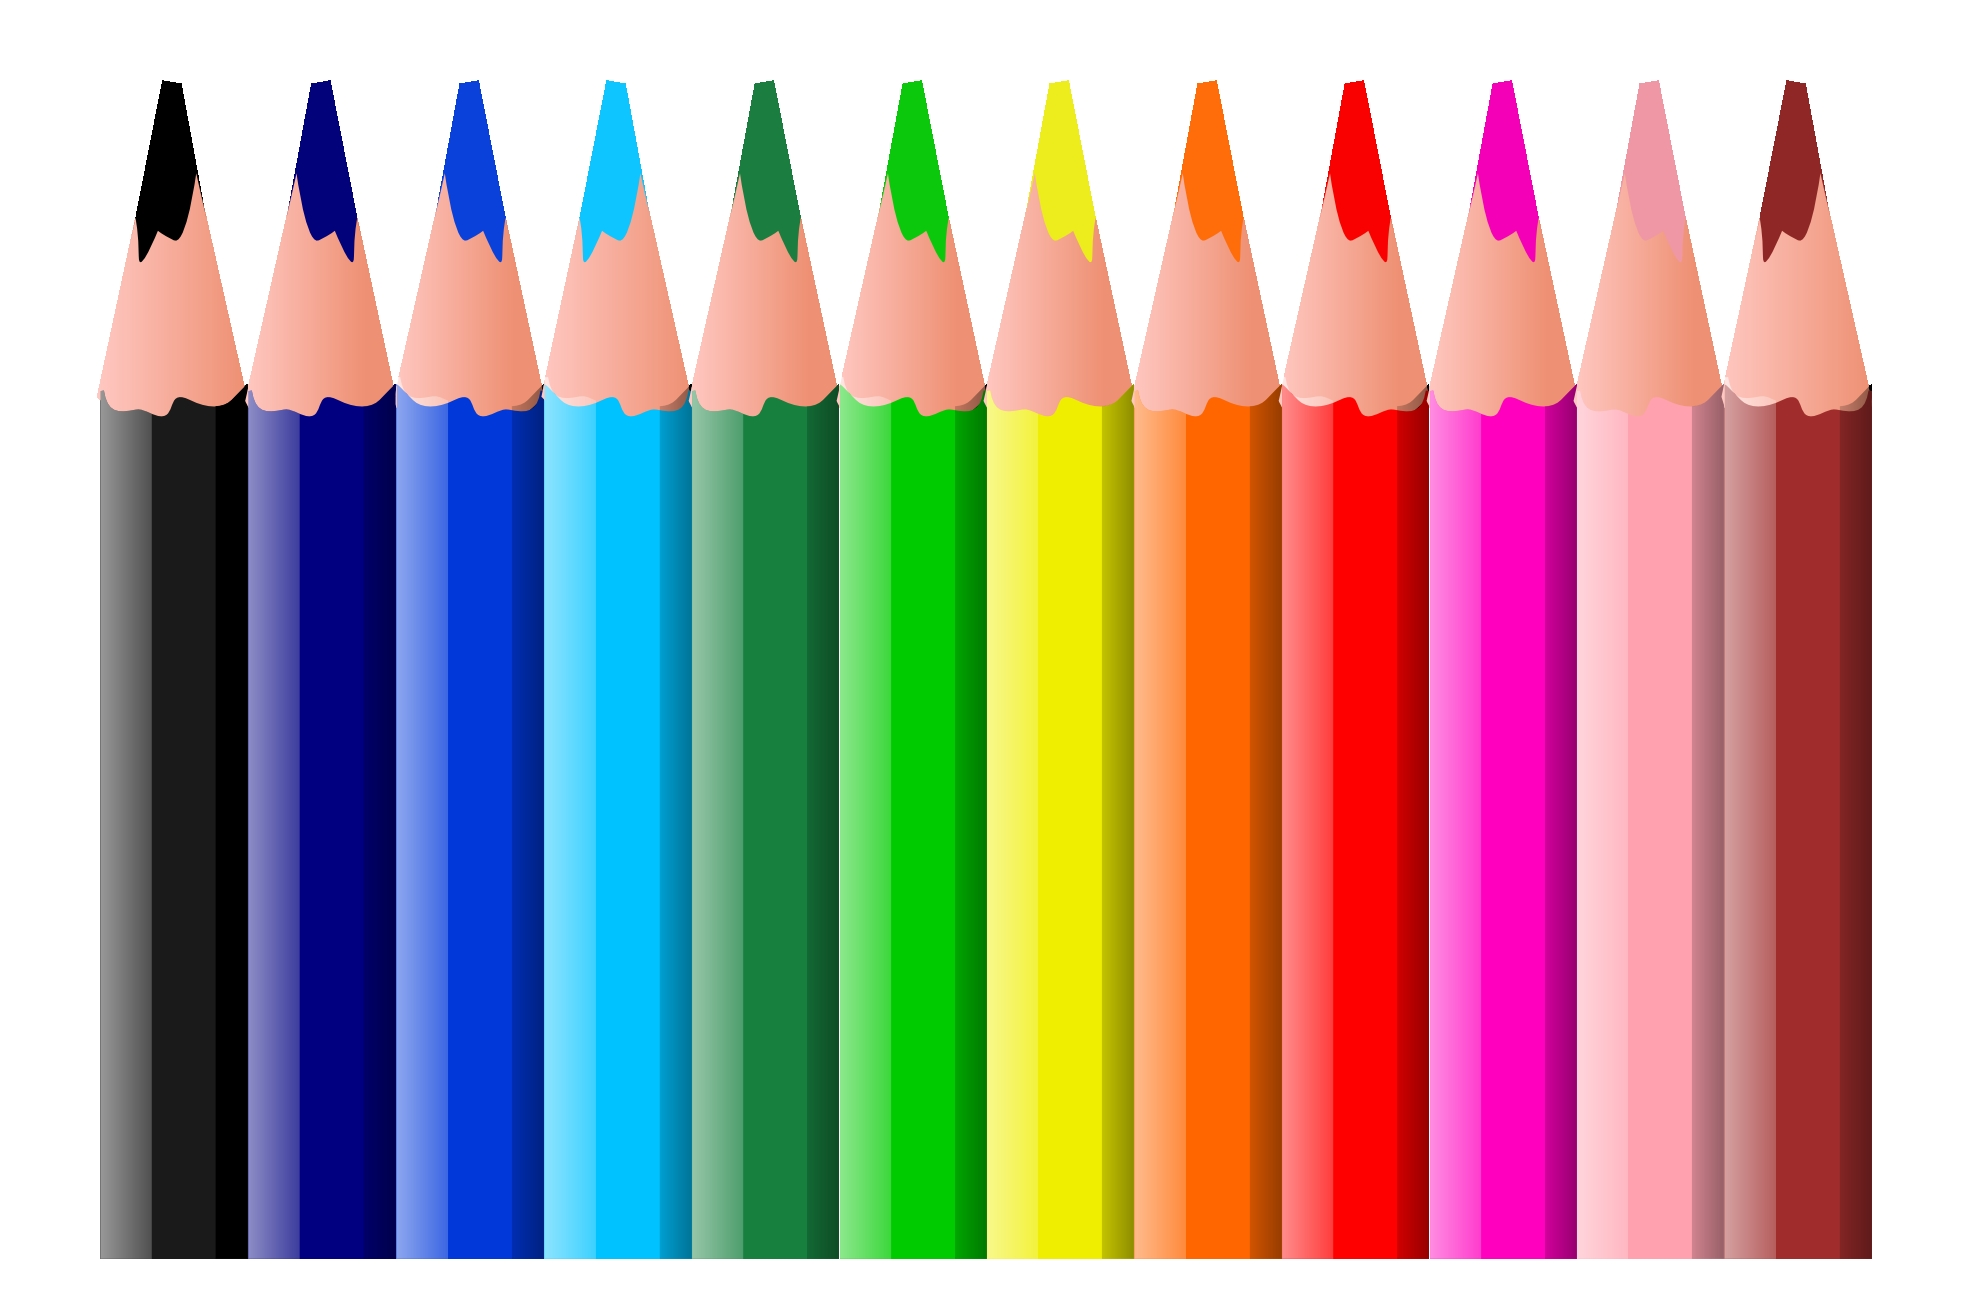 1969x1307 Crayons Clipart Tumundografico